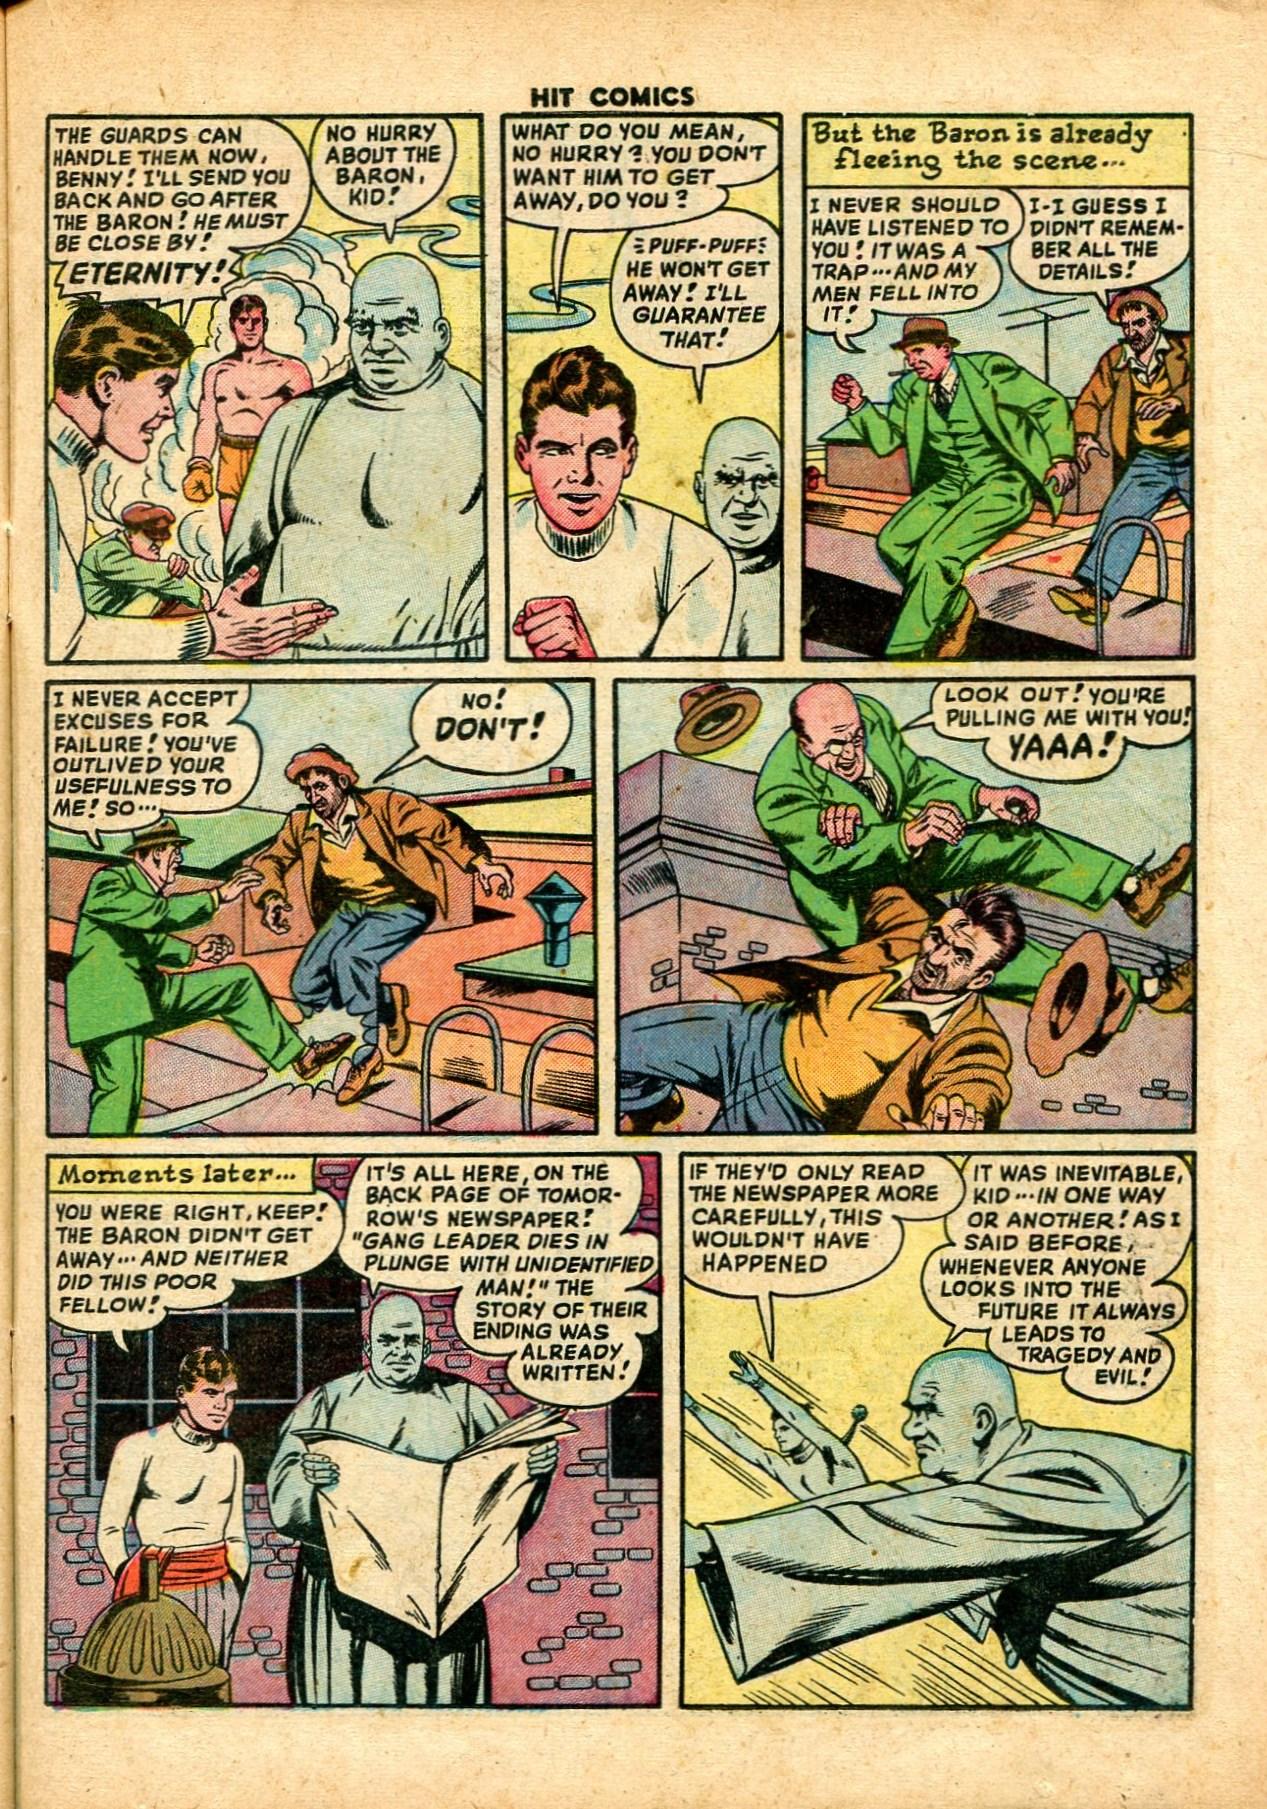 Read online Hit Comics comic -  Issue #59 - 15